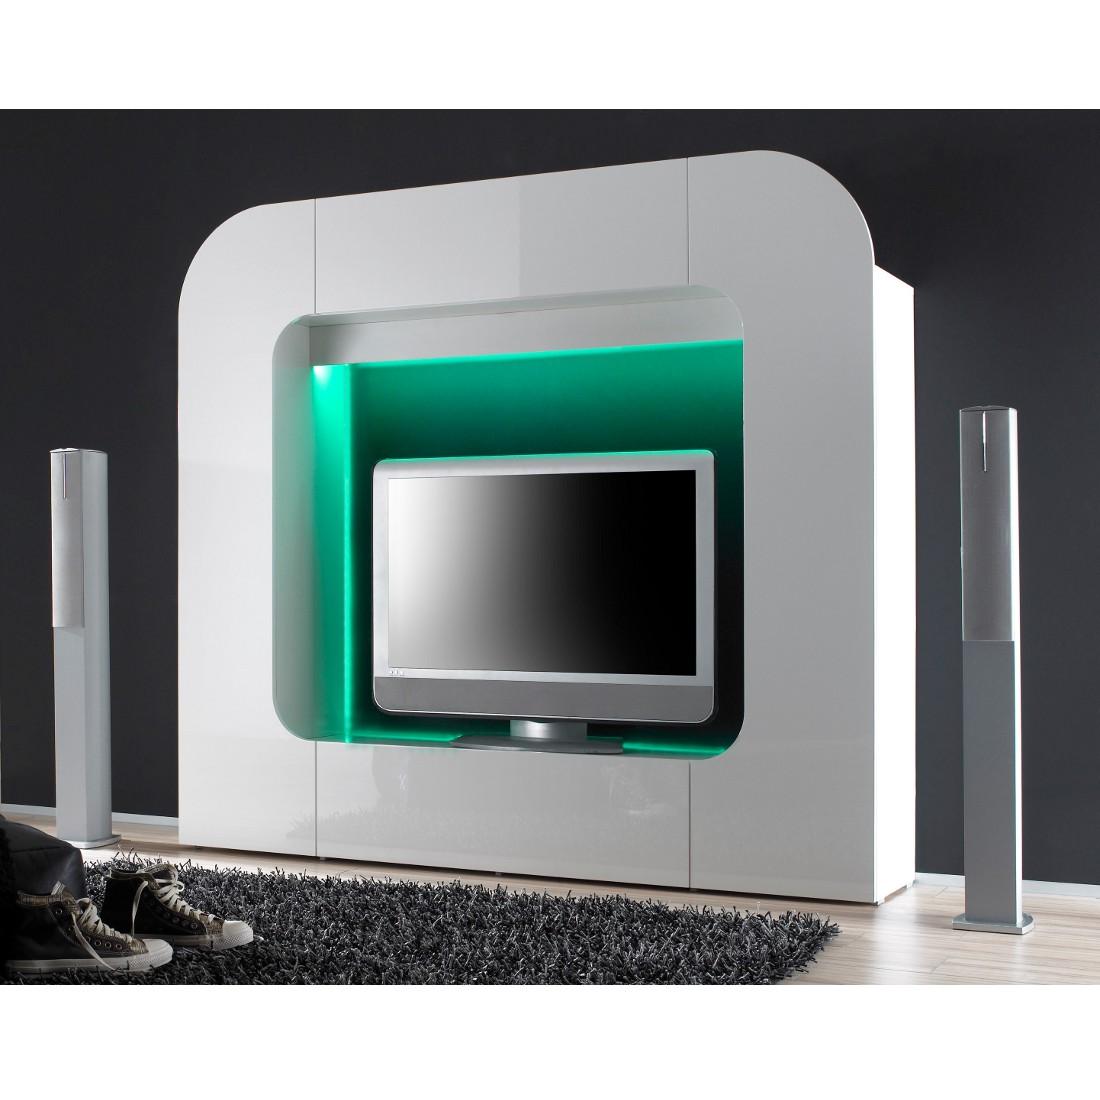 wohnwand tiresa wei hochglanz ausf hrung ohne beleuchtung. Black Bedroom Furniture Sets. Home Design Ideas